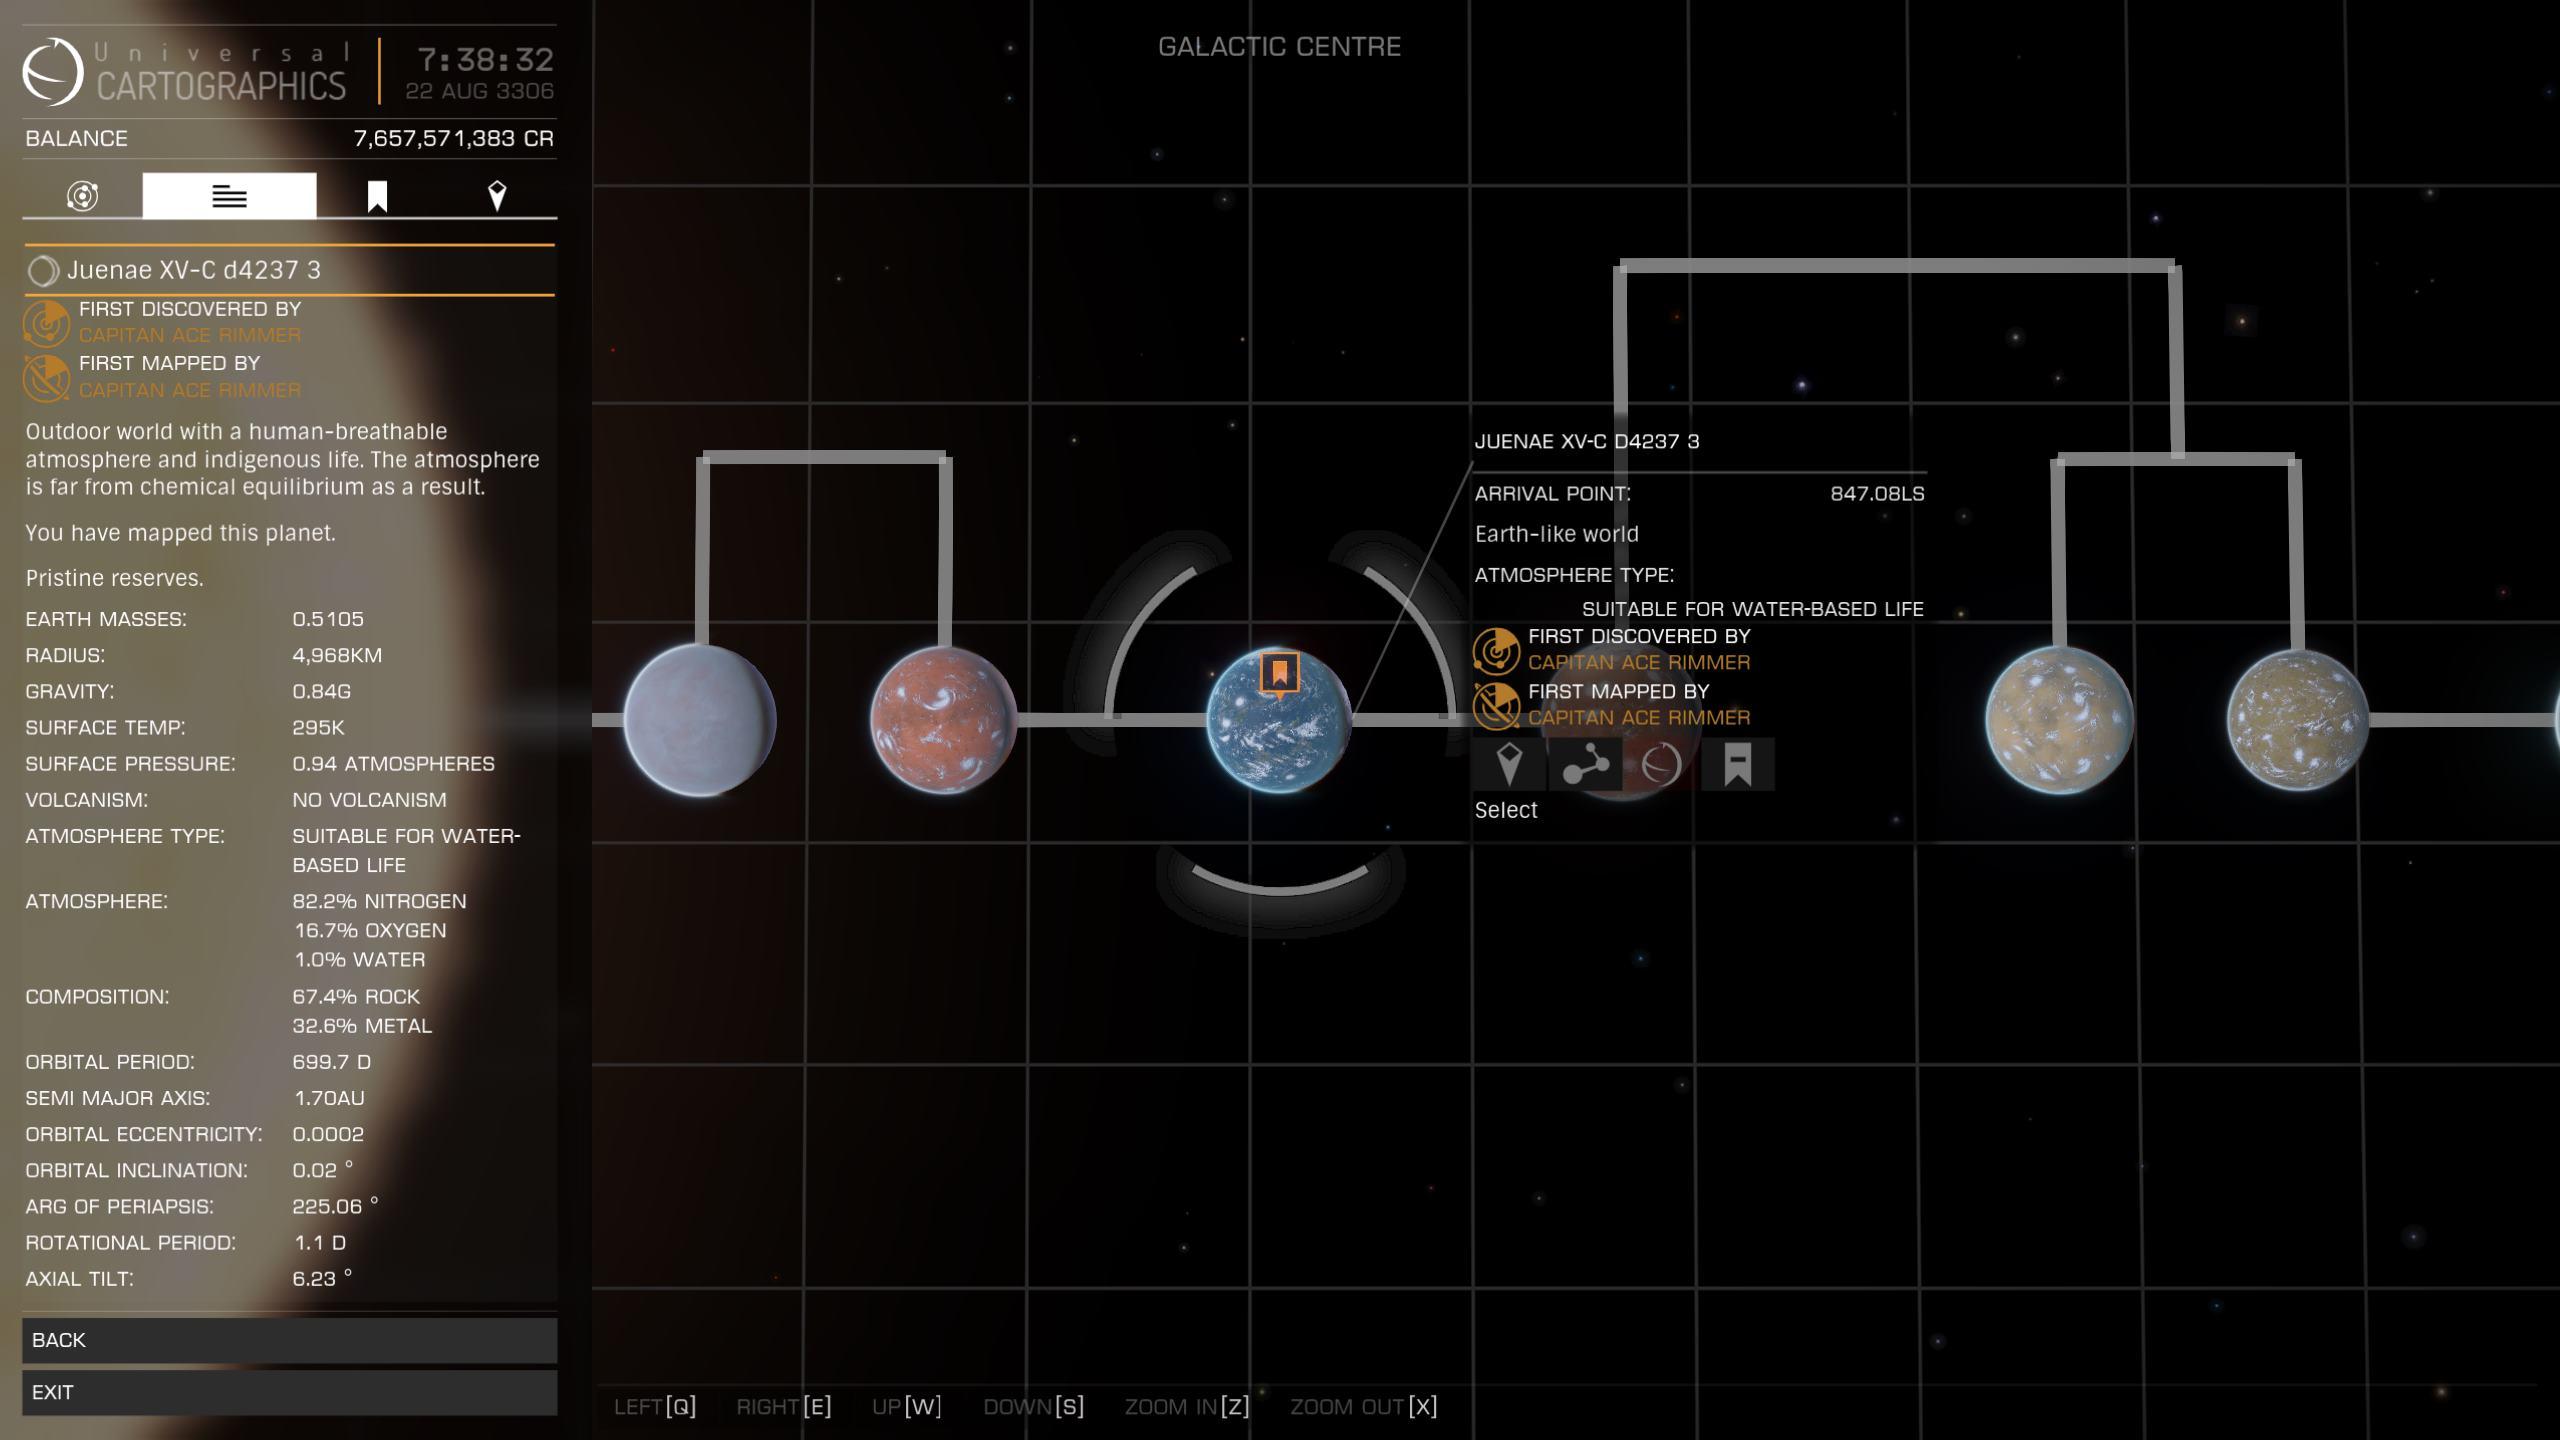 Sagittarius A_2020_08_22_073832.jpg